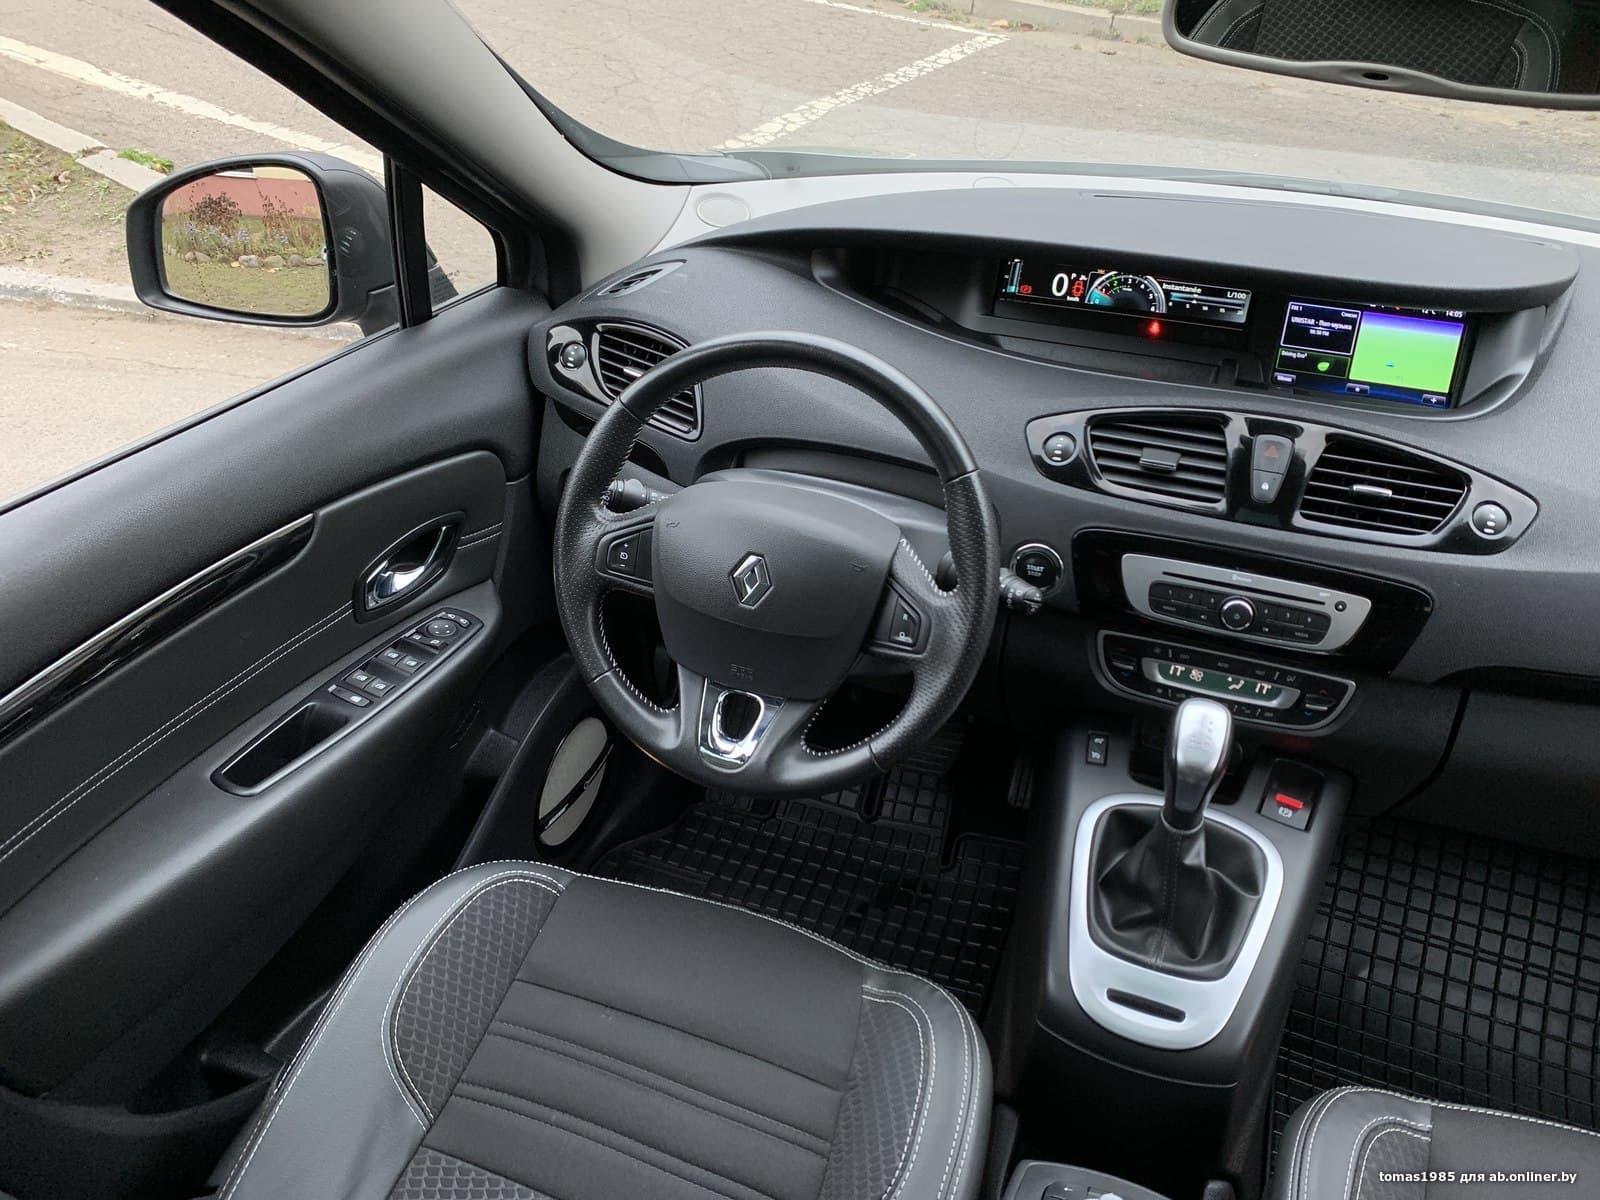 Renault Grand Scenic BOSE